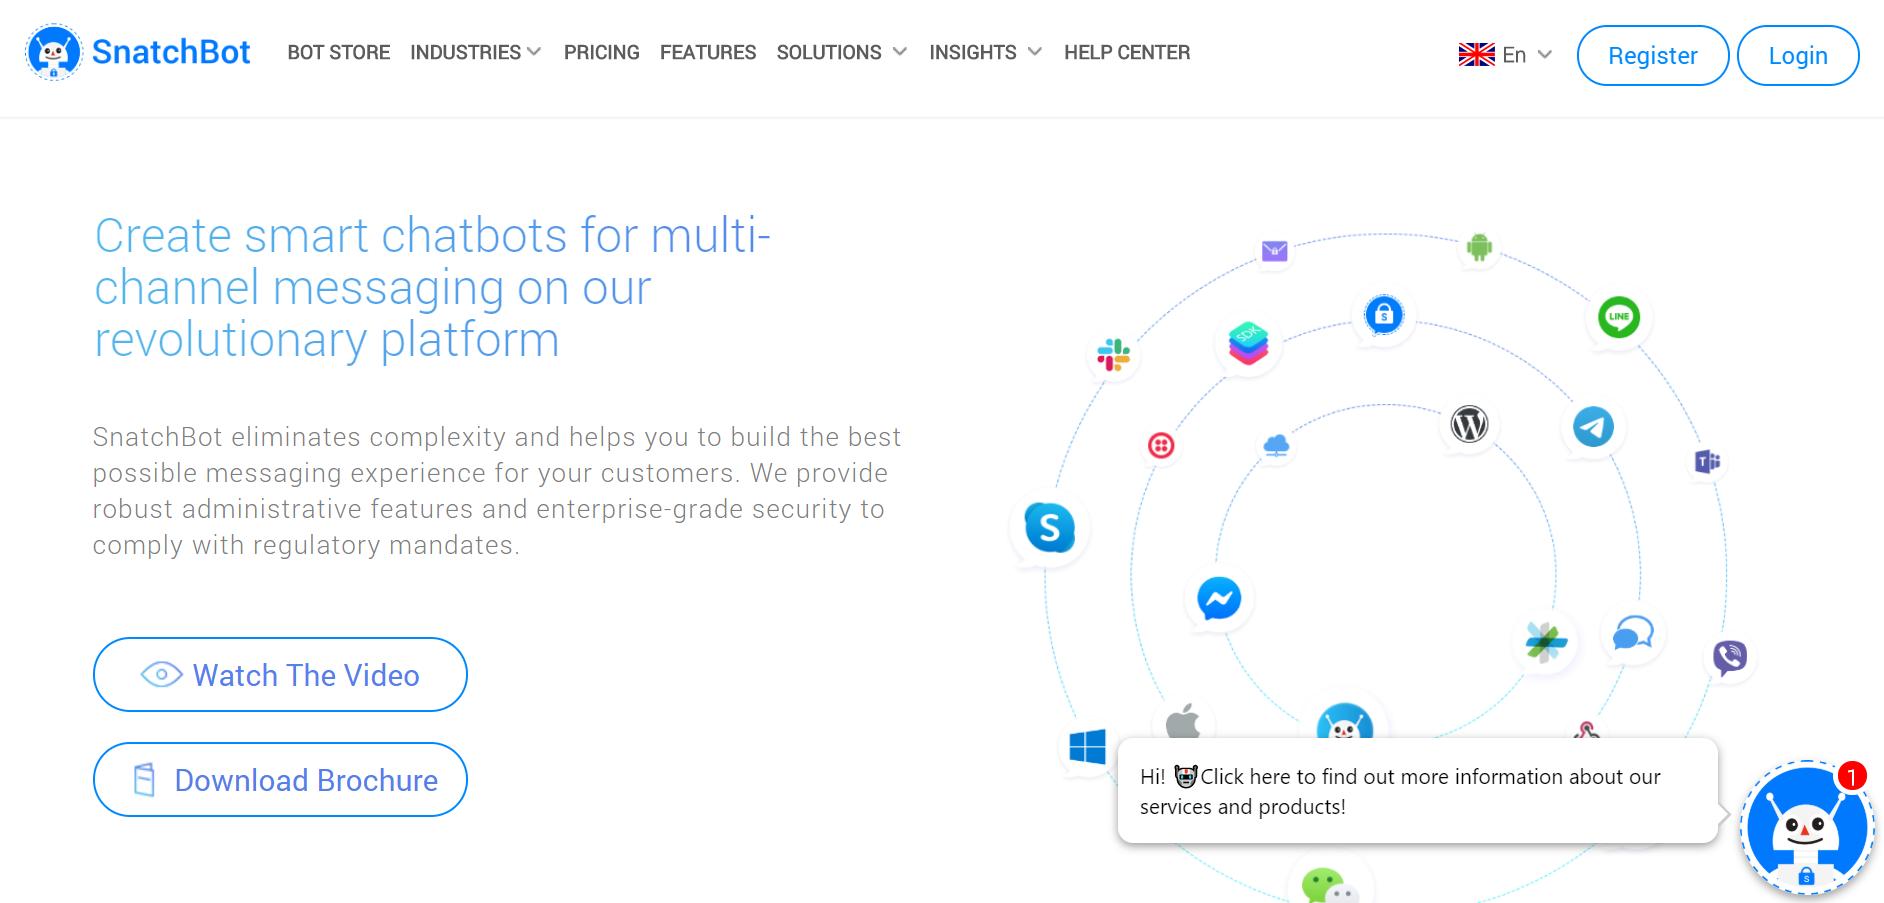 best SMS marketing services - Snatchbot